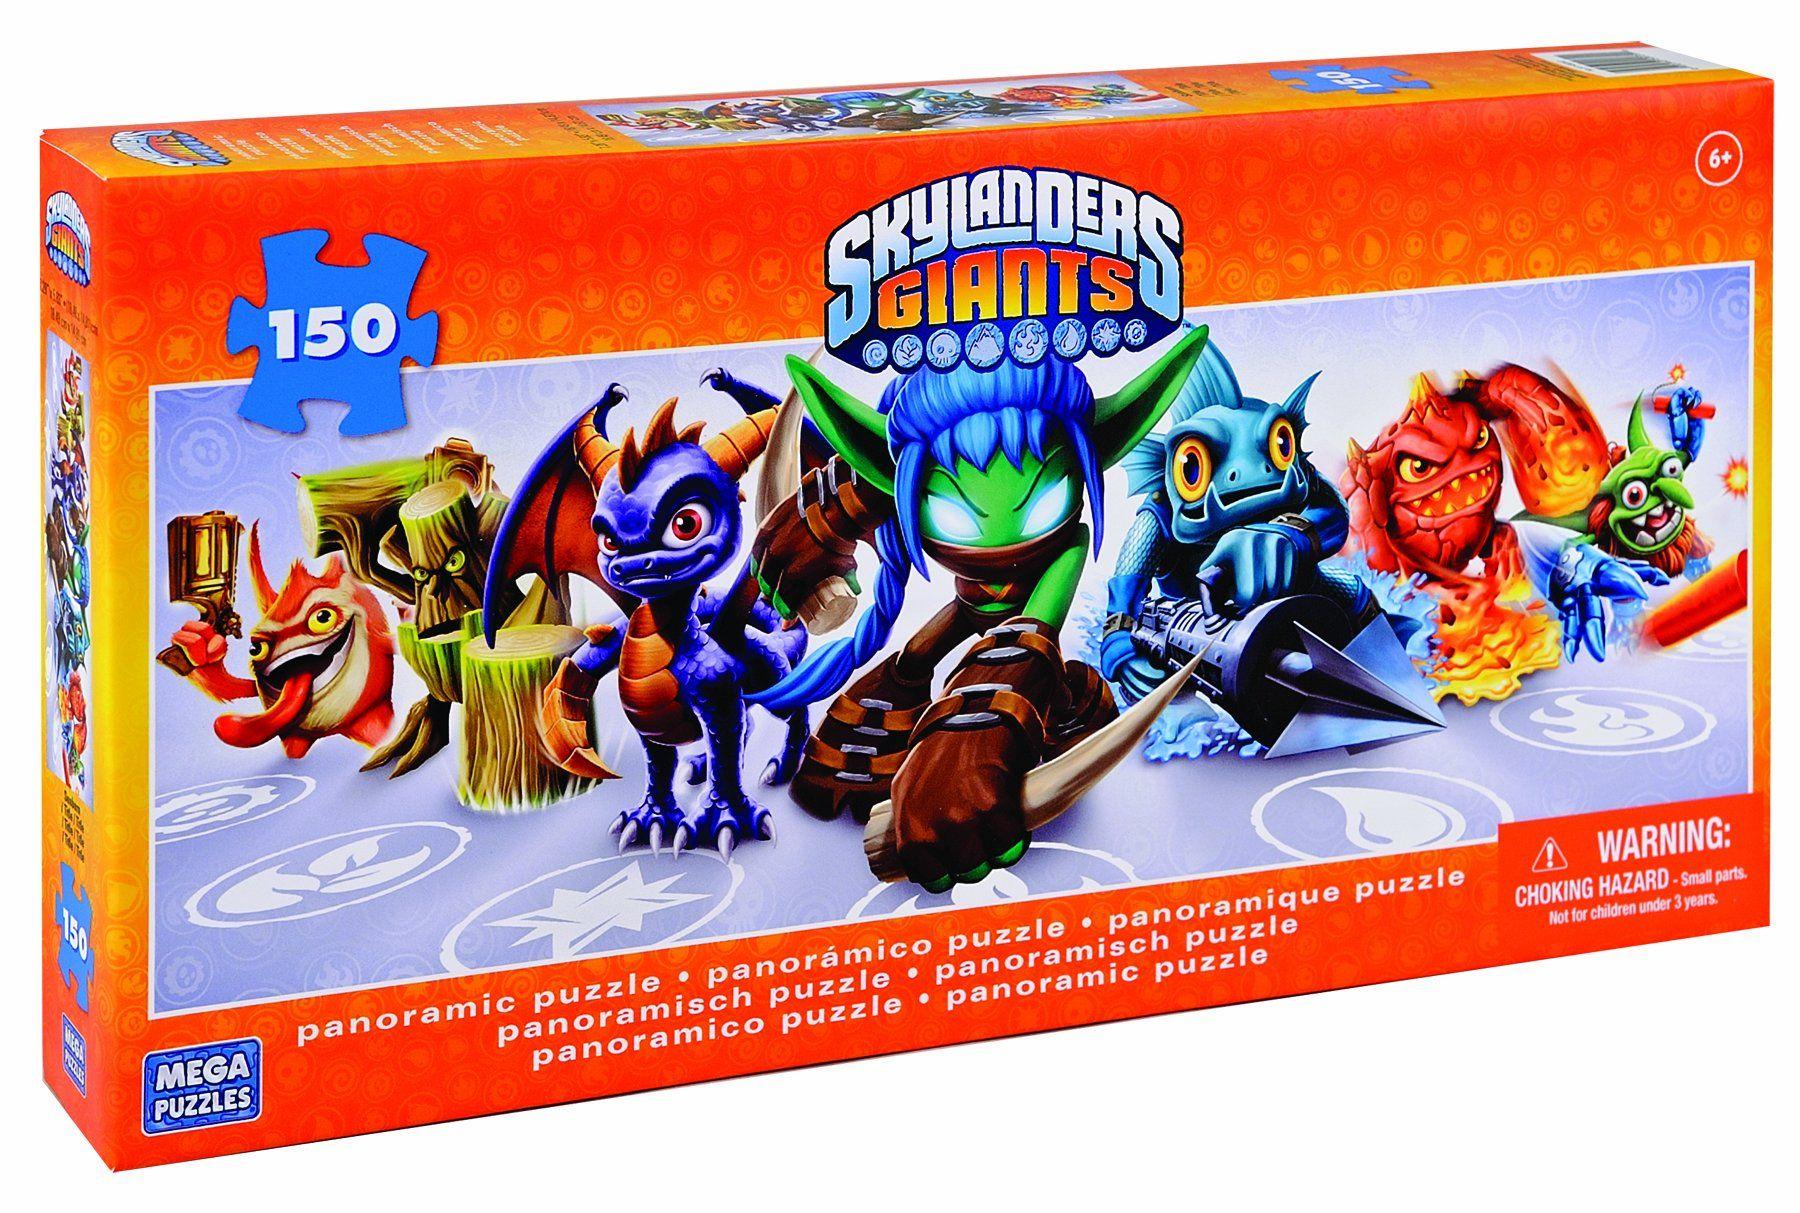 Amazon.com: Skylanders Giants Mega Puzzles 150 Piece Panoramic Jigsaw: Toys & Games